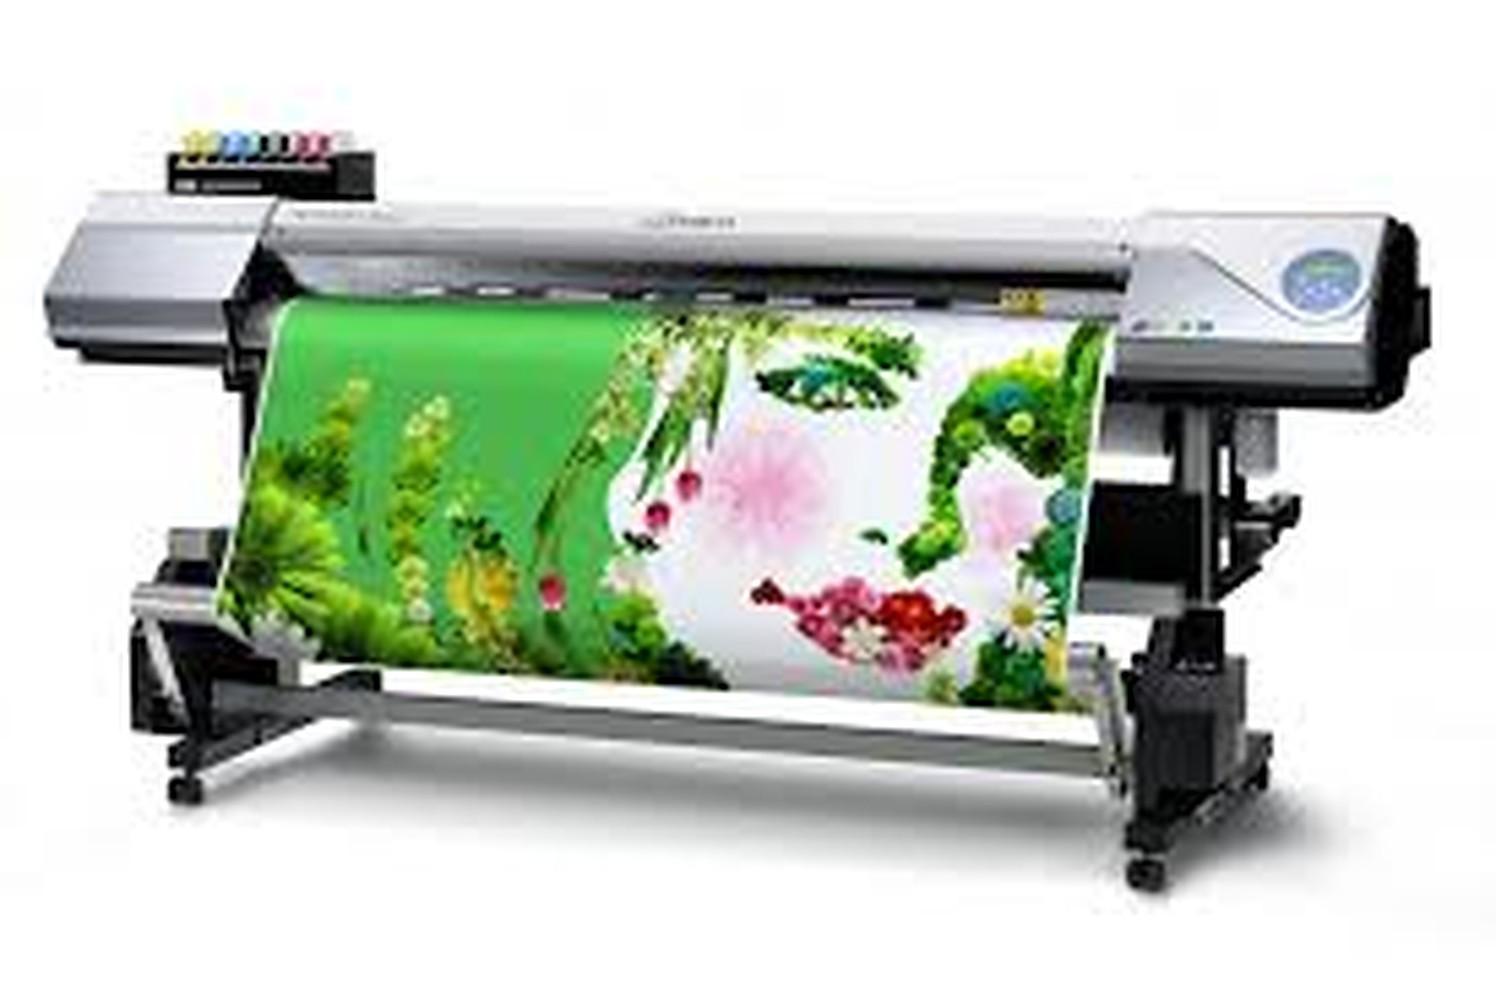 AVM  Printers, PRINTING PRESS,  service in Kozhikode Town, Kozhikode